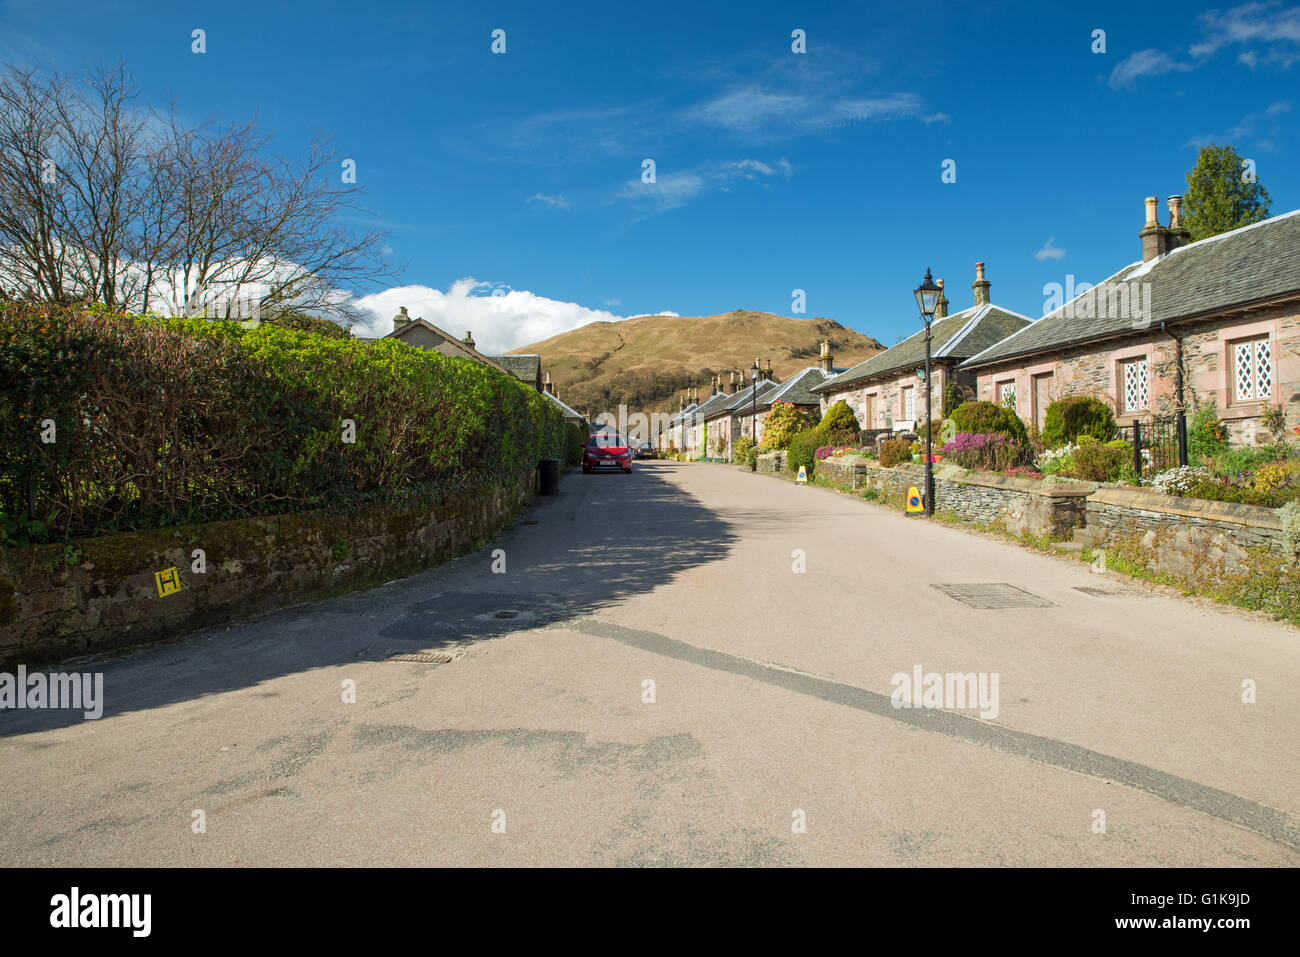 Luss Village Scotland United Kingdom - Stock Image